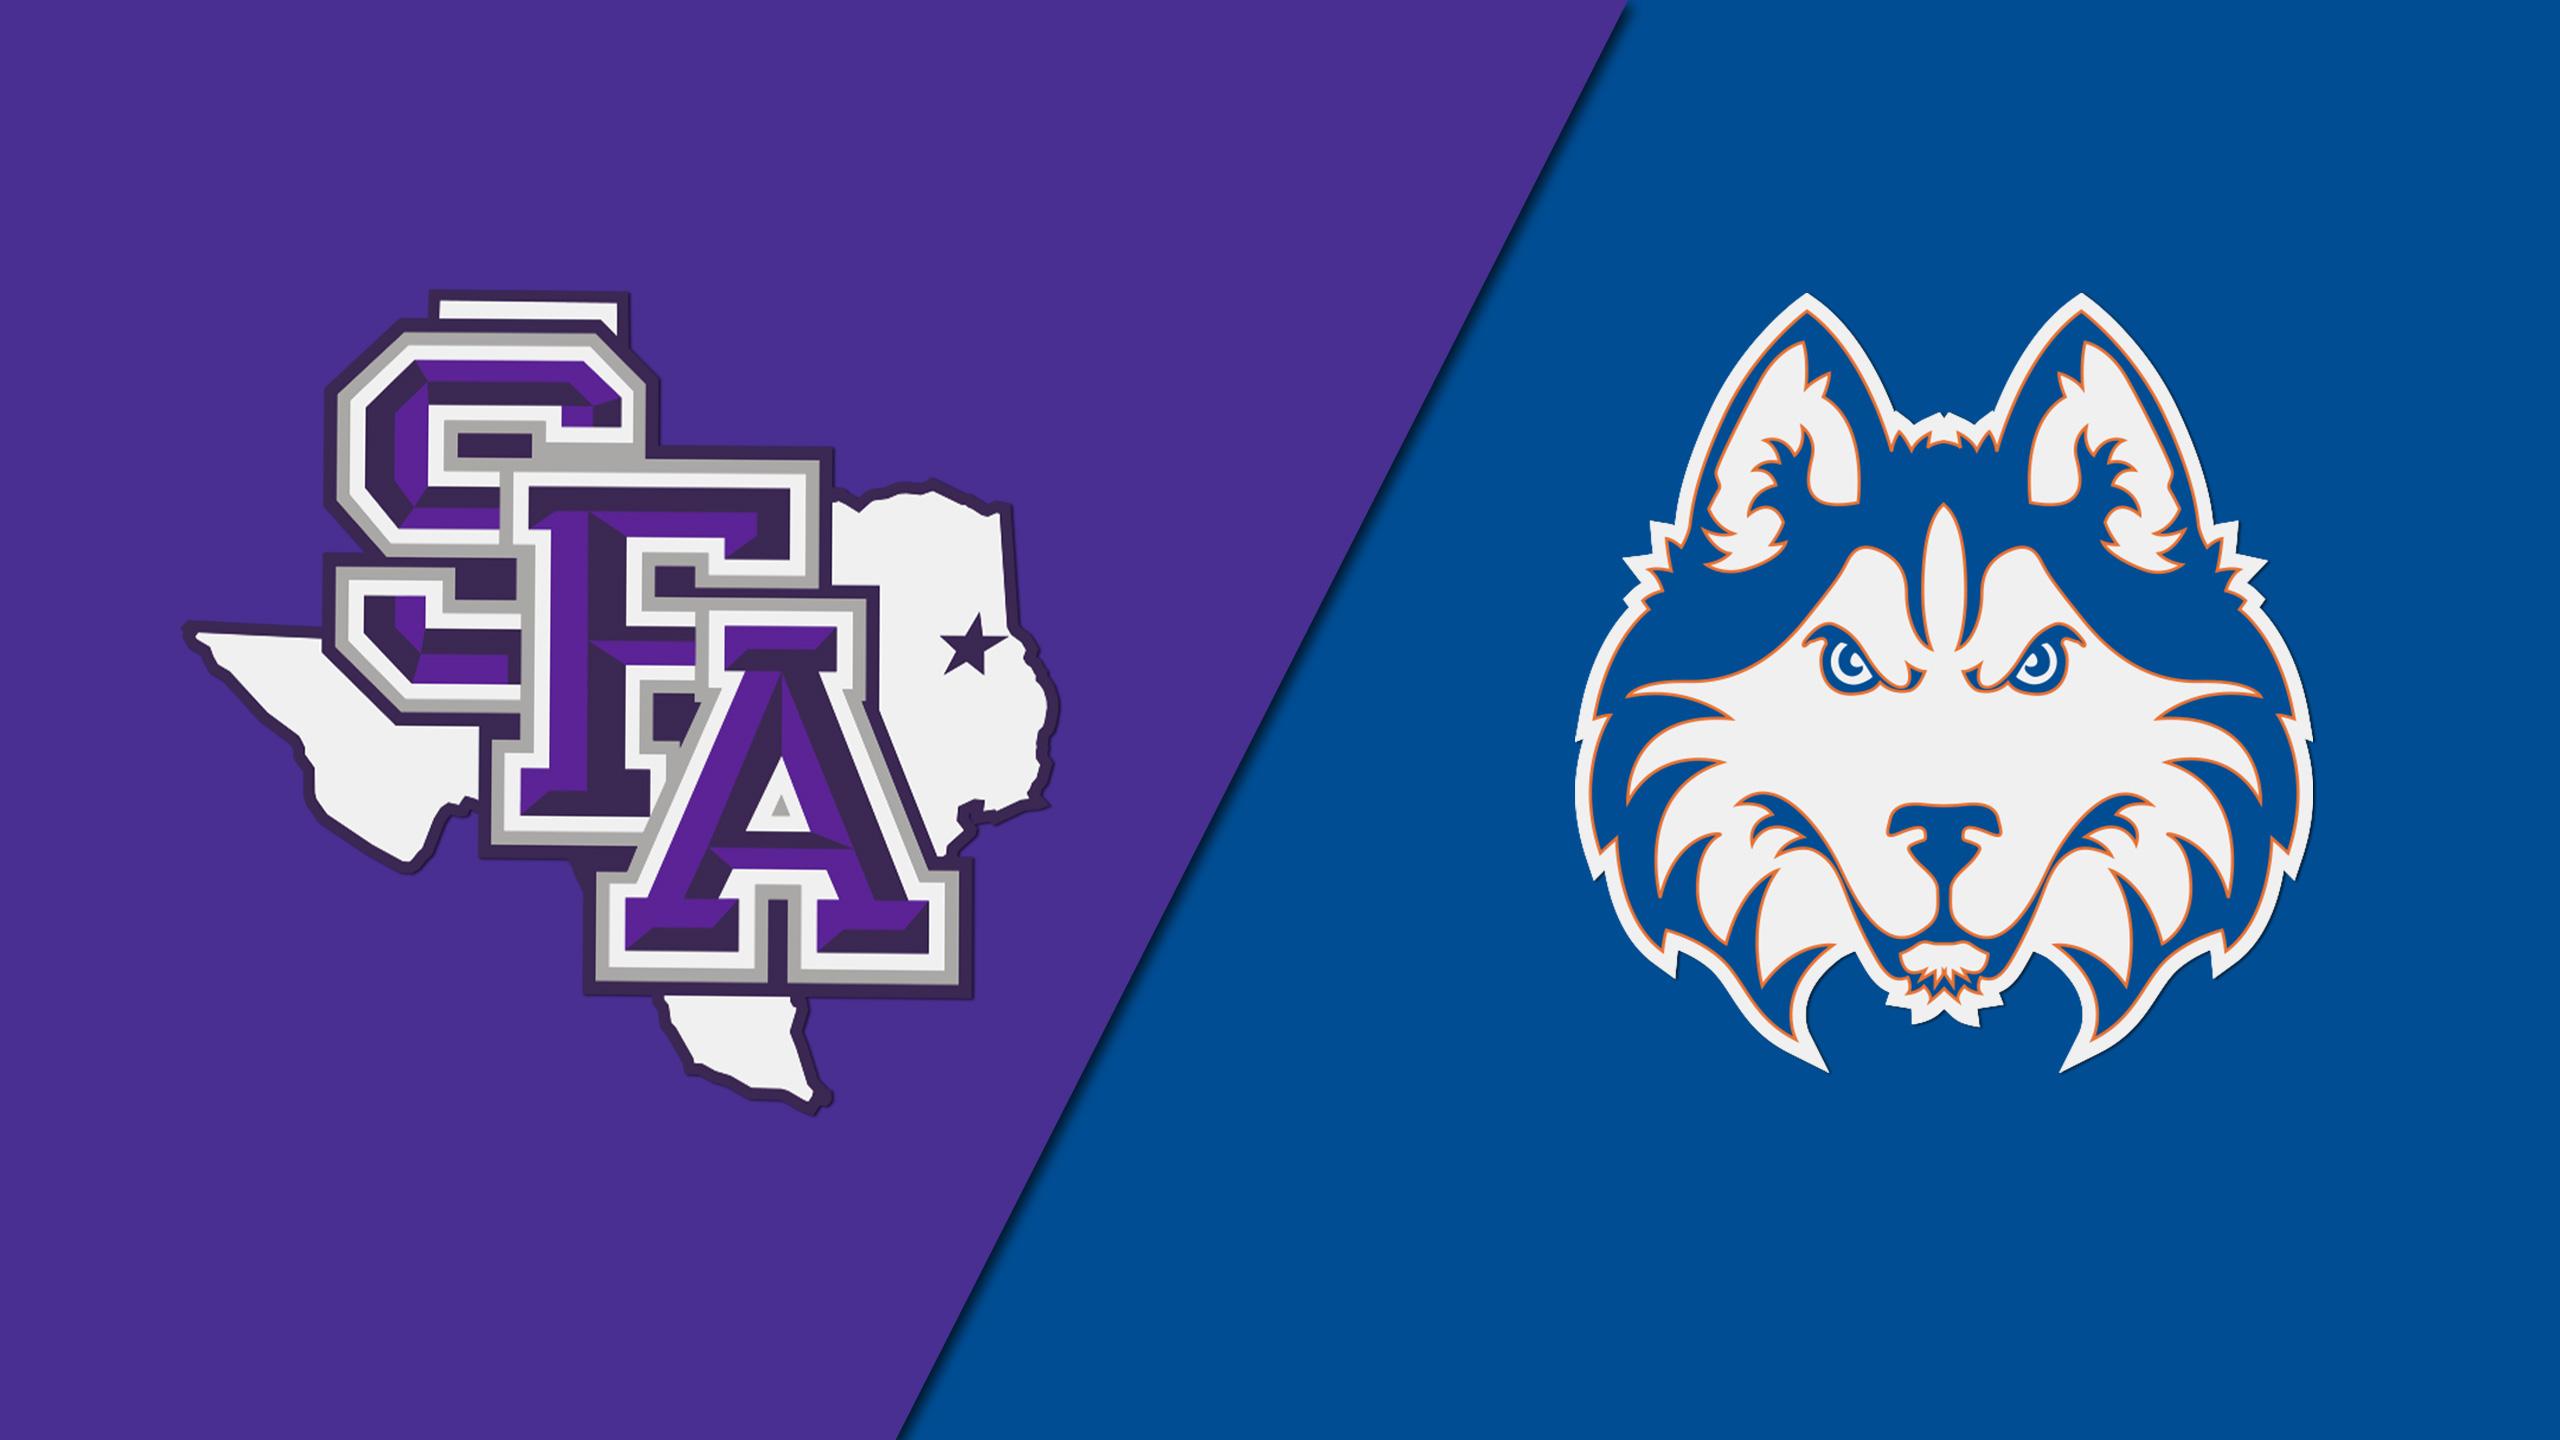 Stephen F. Austin vs. Houston Baptist (Football)